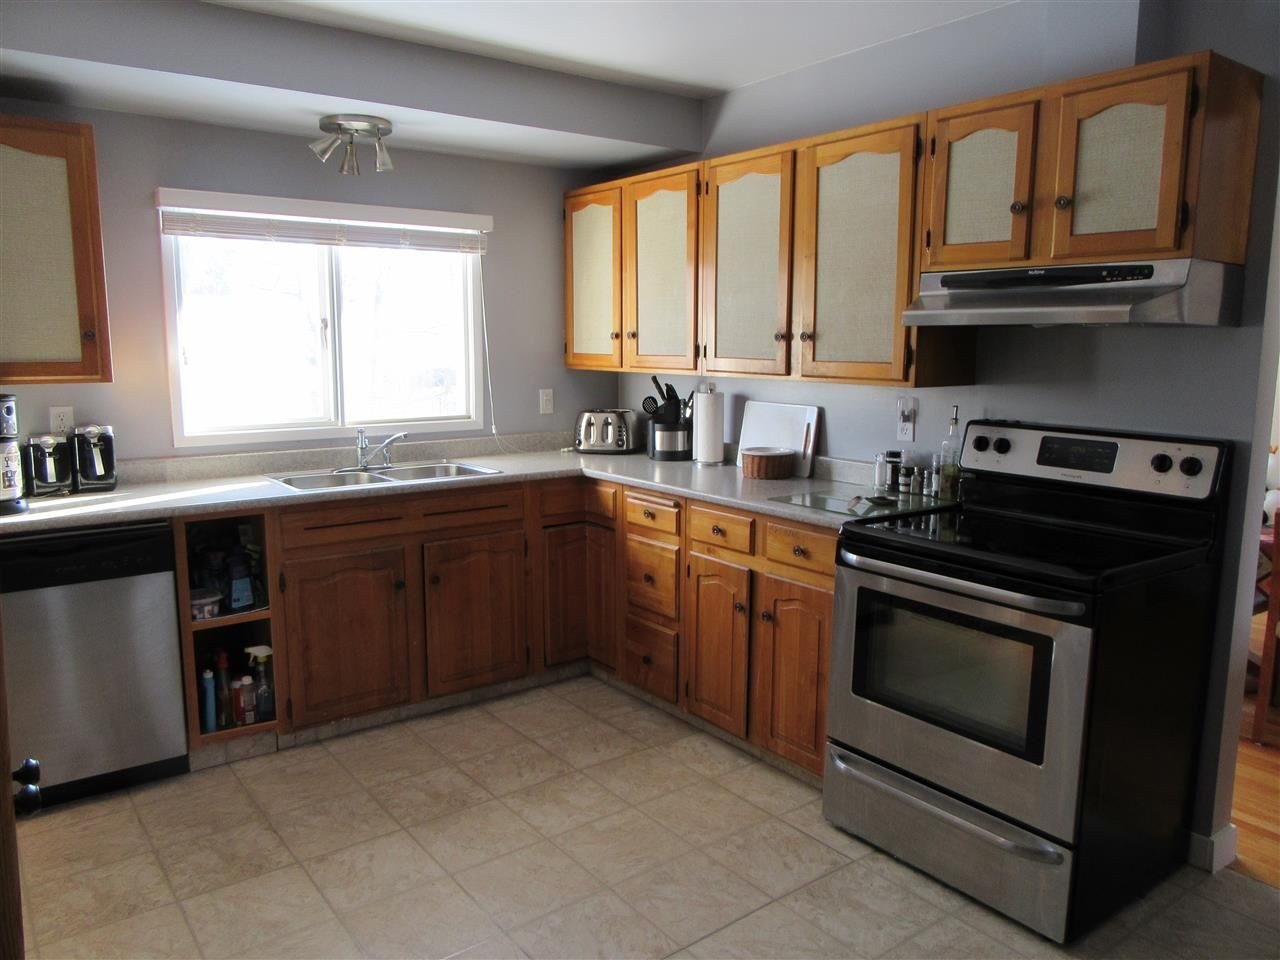 Photo 5: Photos: 522 RADCLIFFE Drive: Quinson House for sale (PG City West (Zone 71))  : MLS®# R2433646